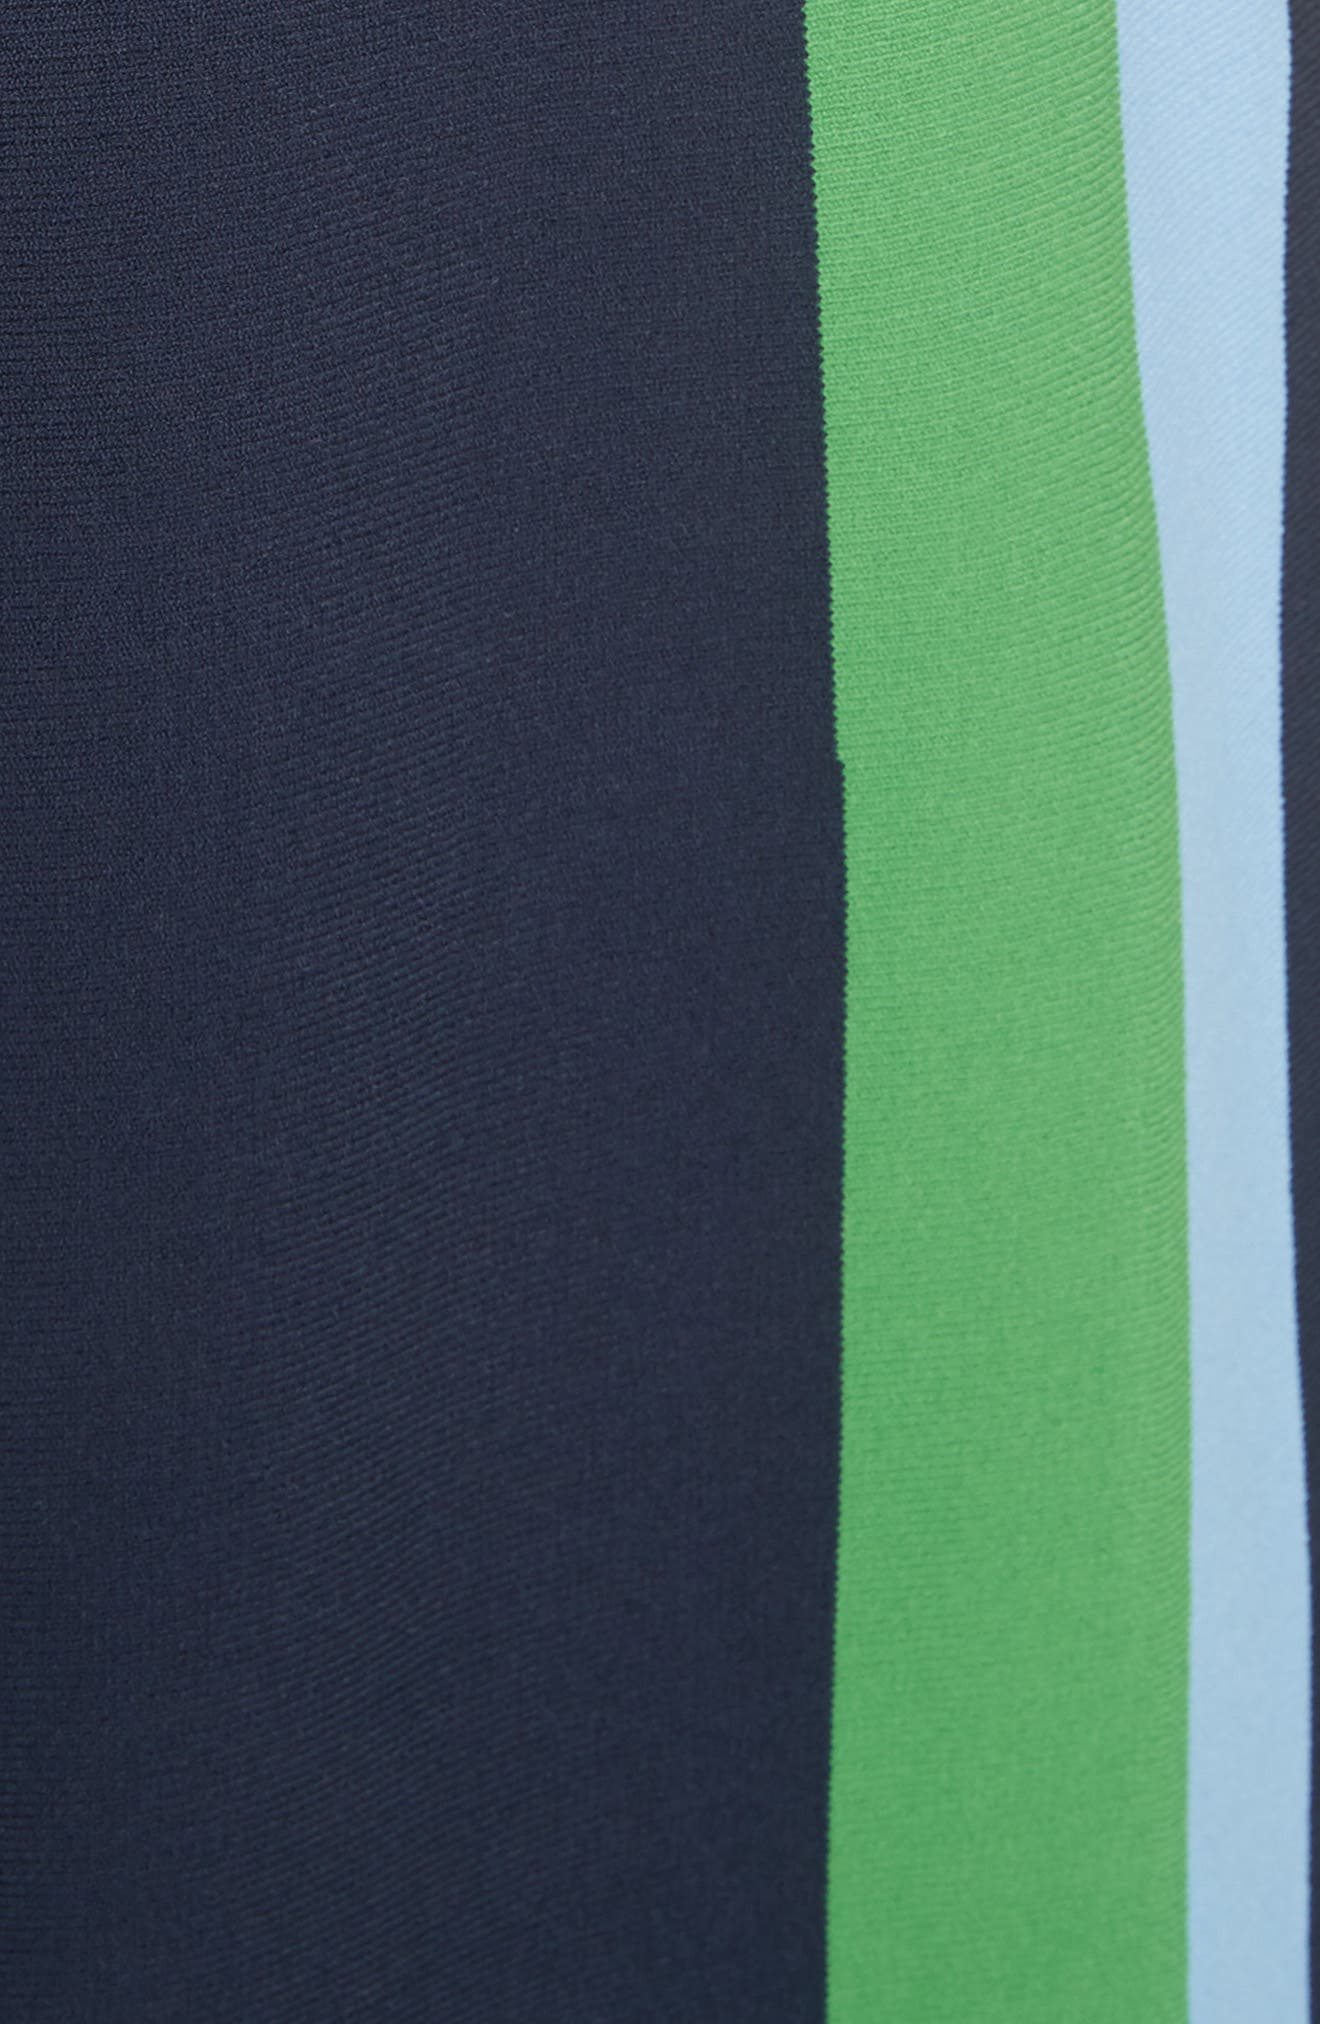 Tech Knit Colorblock Skirt,                             Alternate thumbnail 5, color,                             405